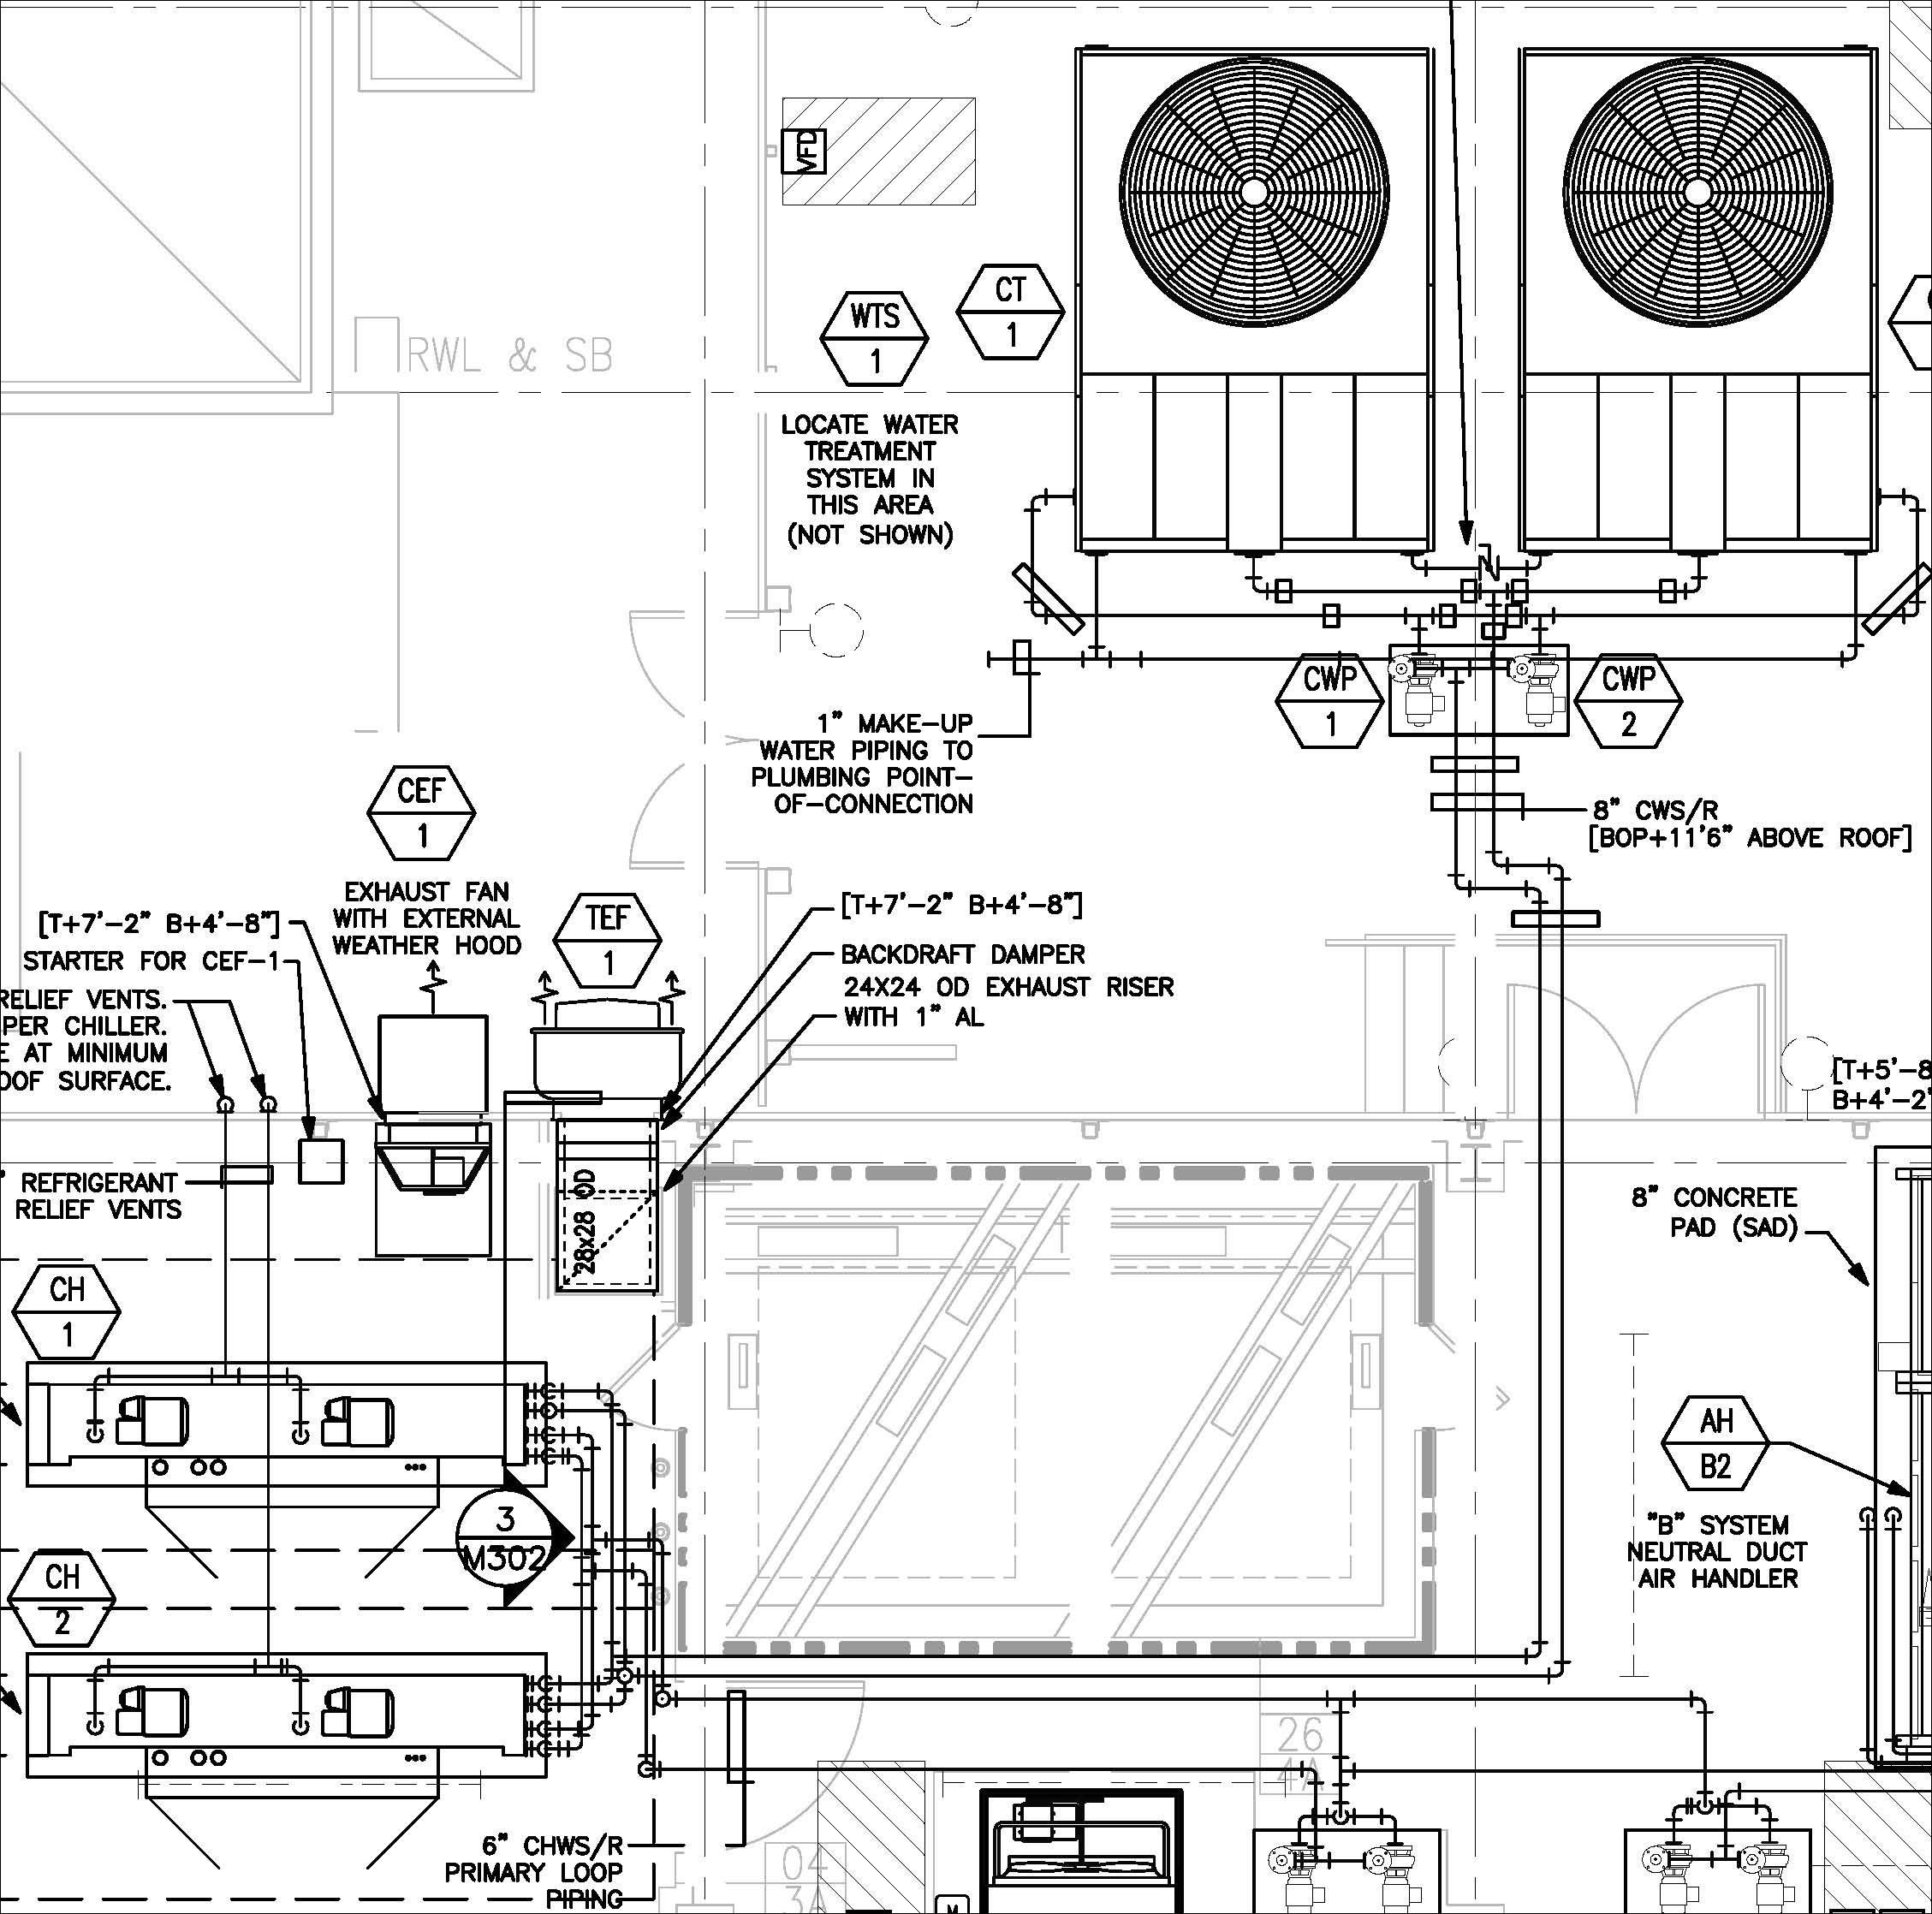 FG_9471] Bohn Let0901F Wiring Diagram Wiring DiagramNnigh Waro Usnes Cajos Mohammedshrine Librar Wiring 101